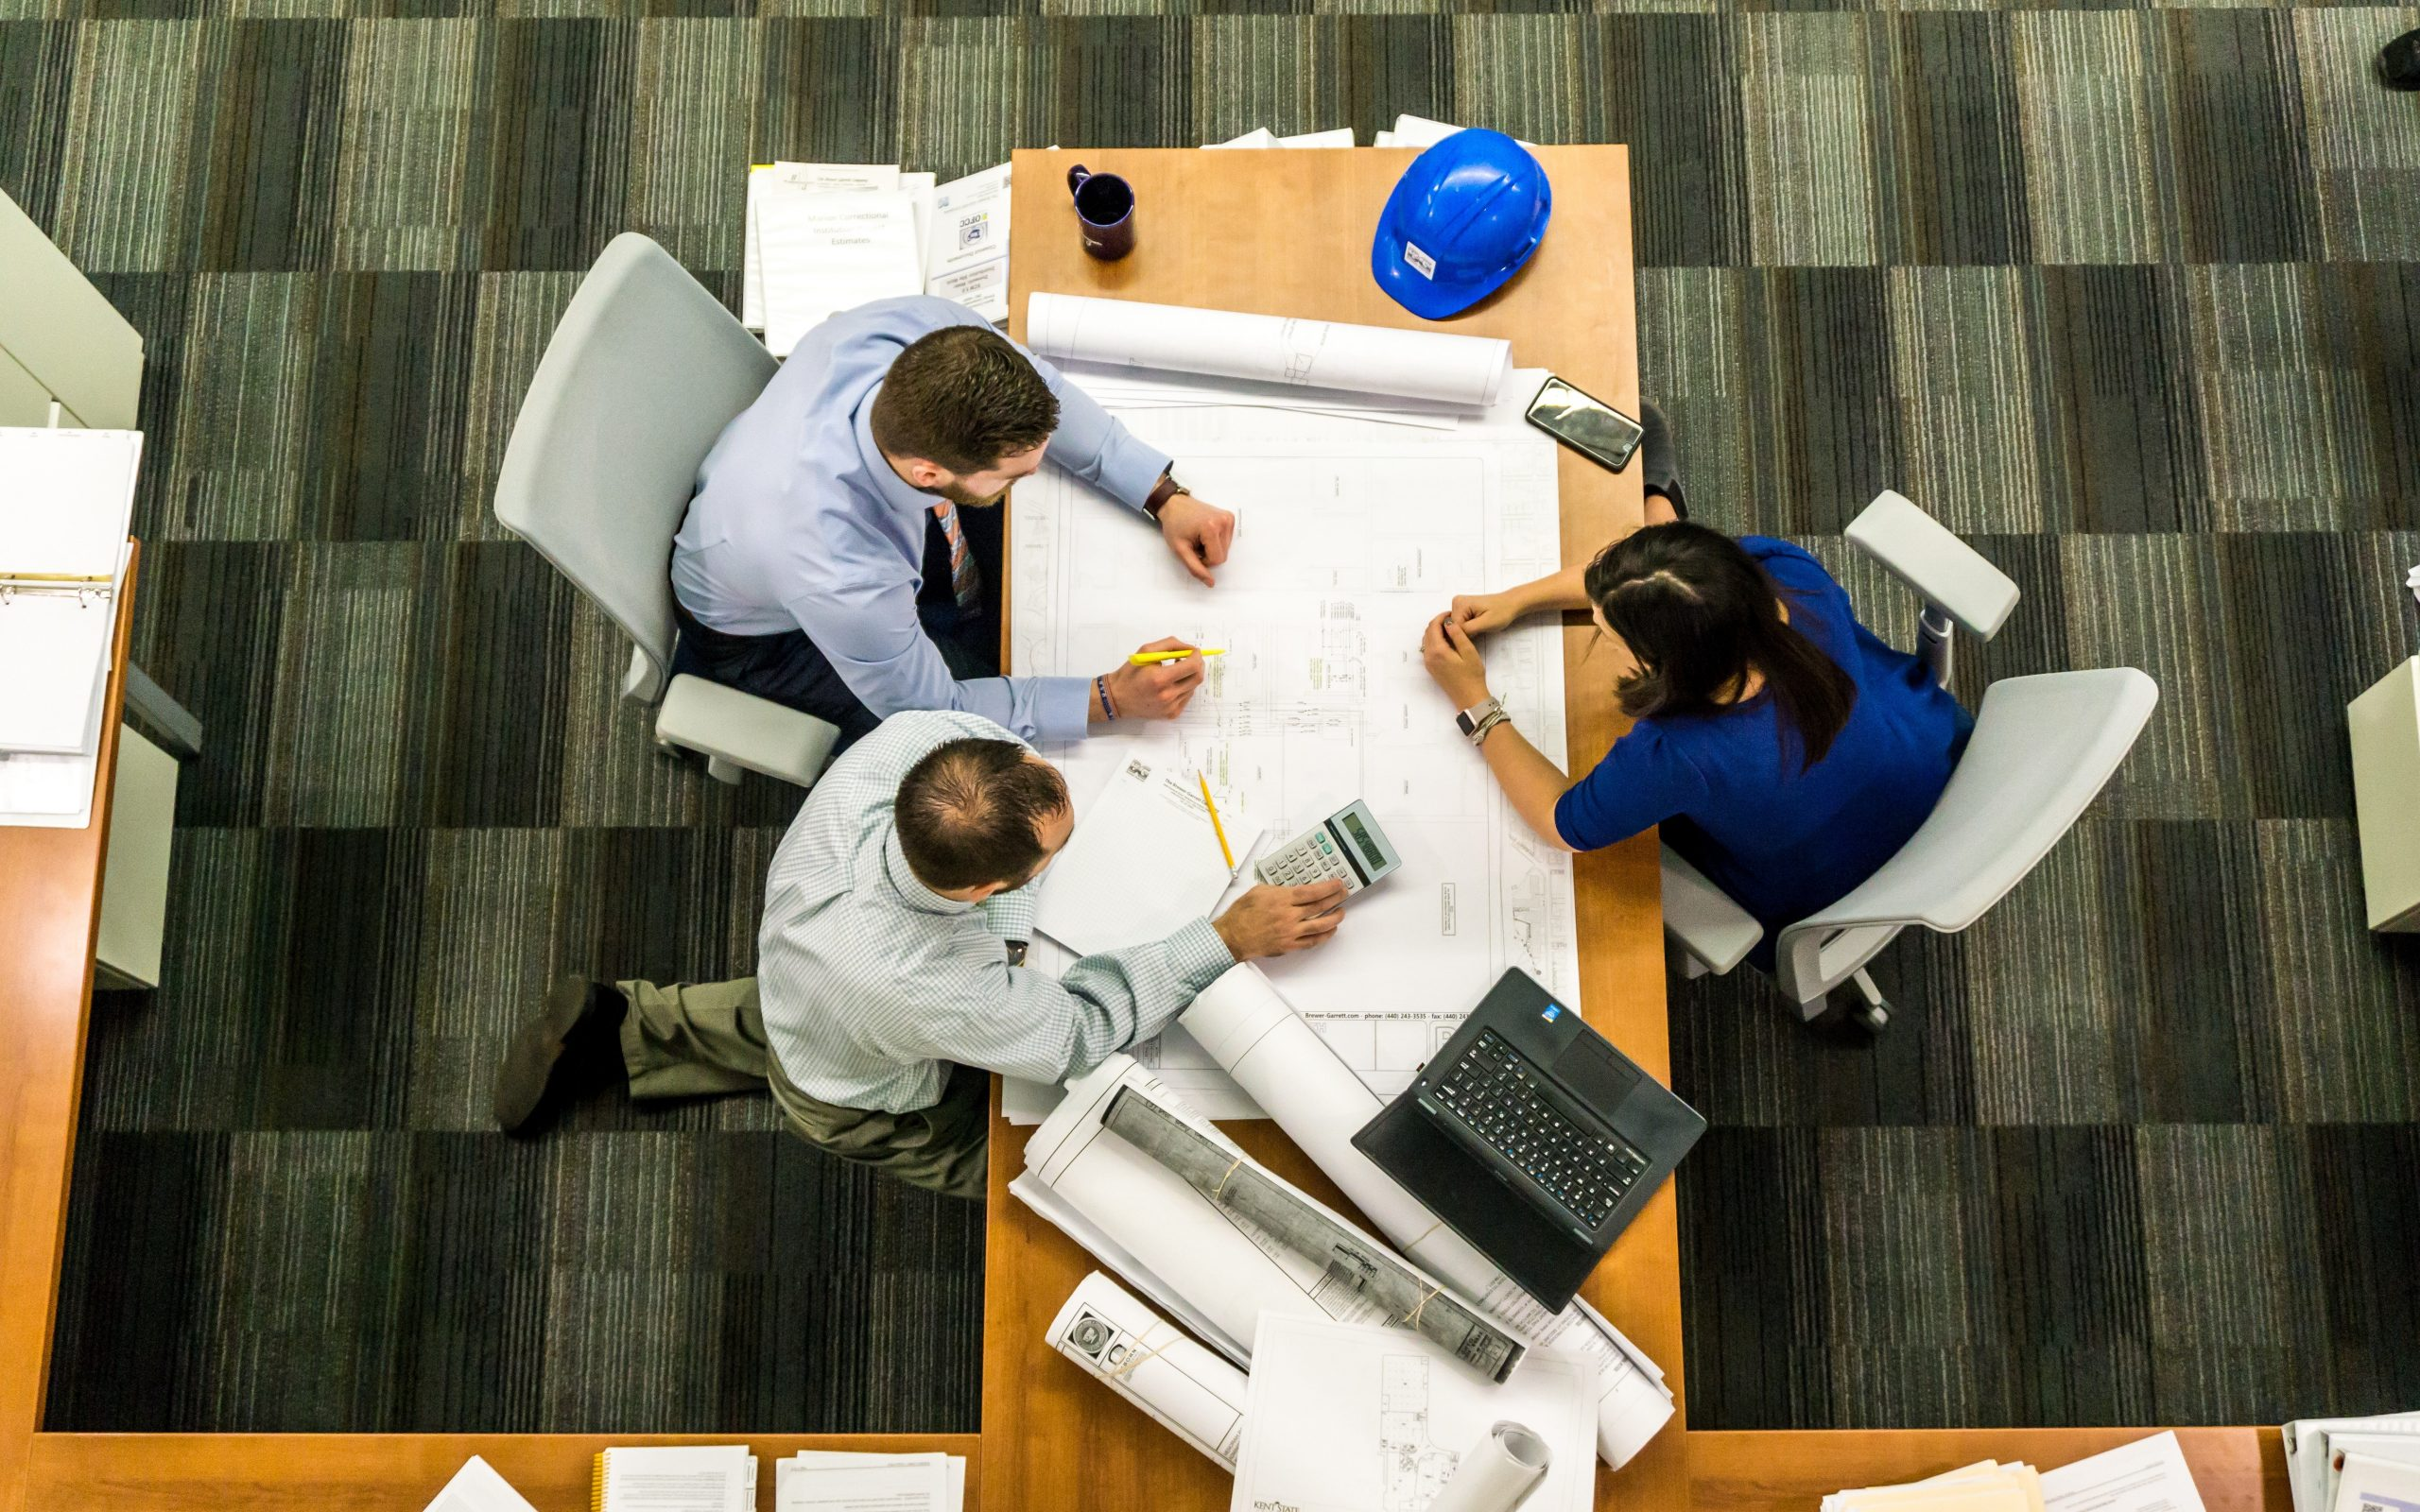 fastnet-service-facility-management